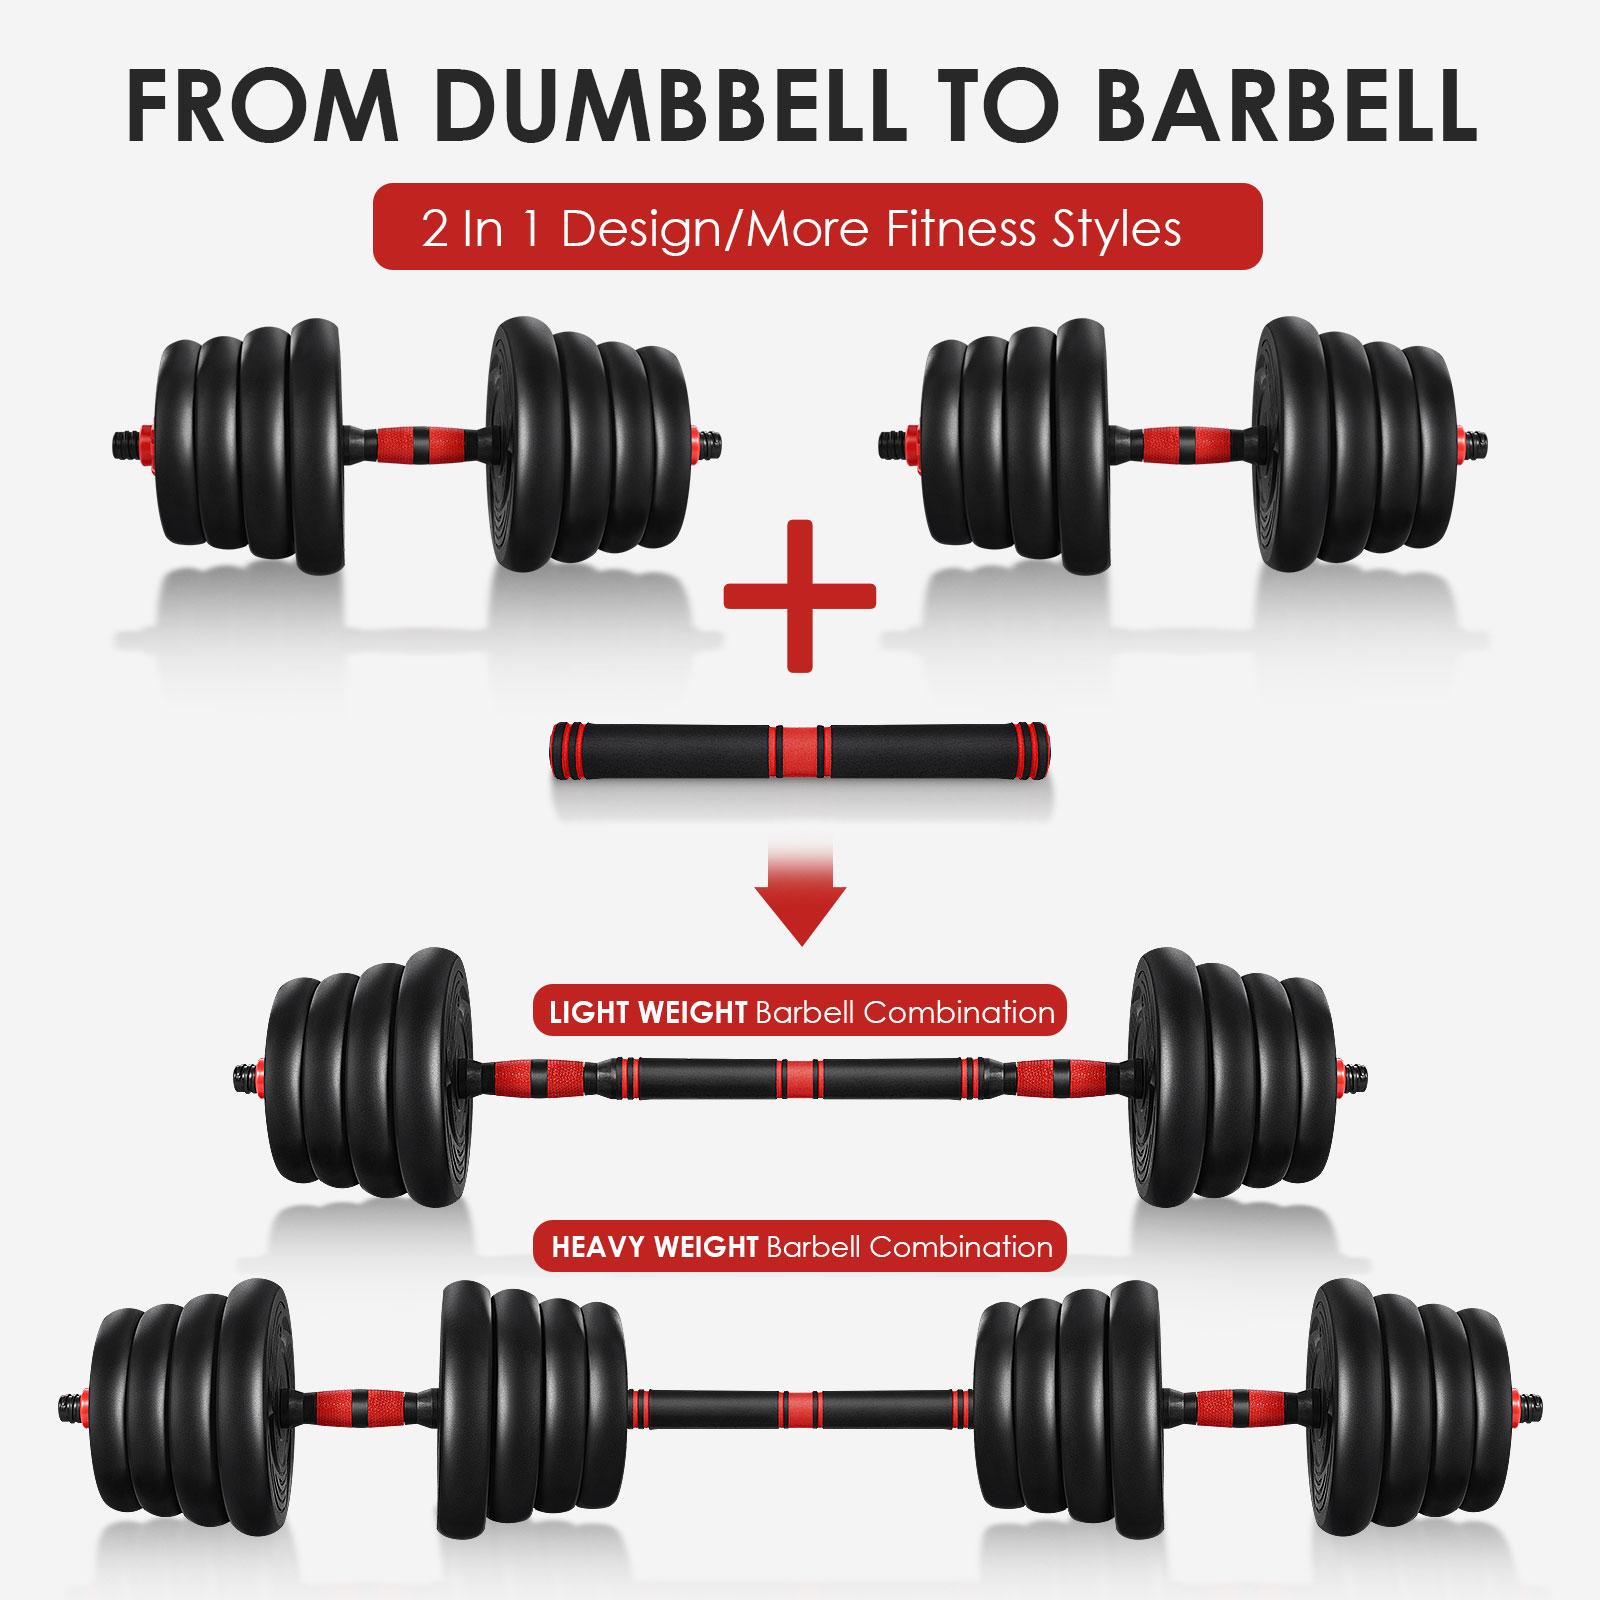 ETEREAUTY Dumbbell Set 30KG,Adjustable Dumbbell Weights Set for Men and Women, Solid Dumbbells Barbell Set for Home Fitness (Connectable)